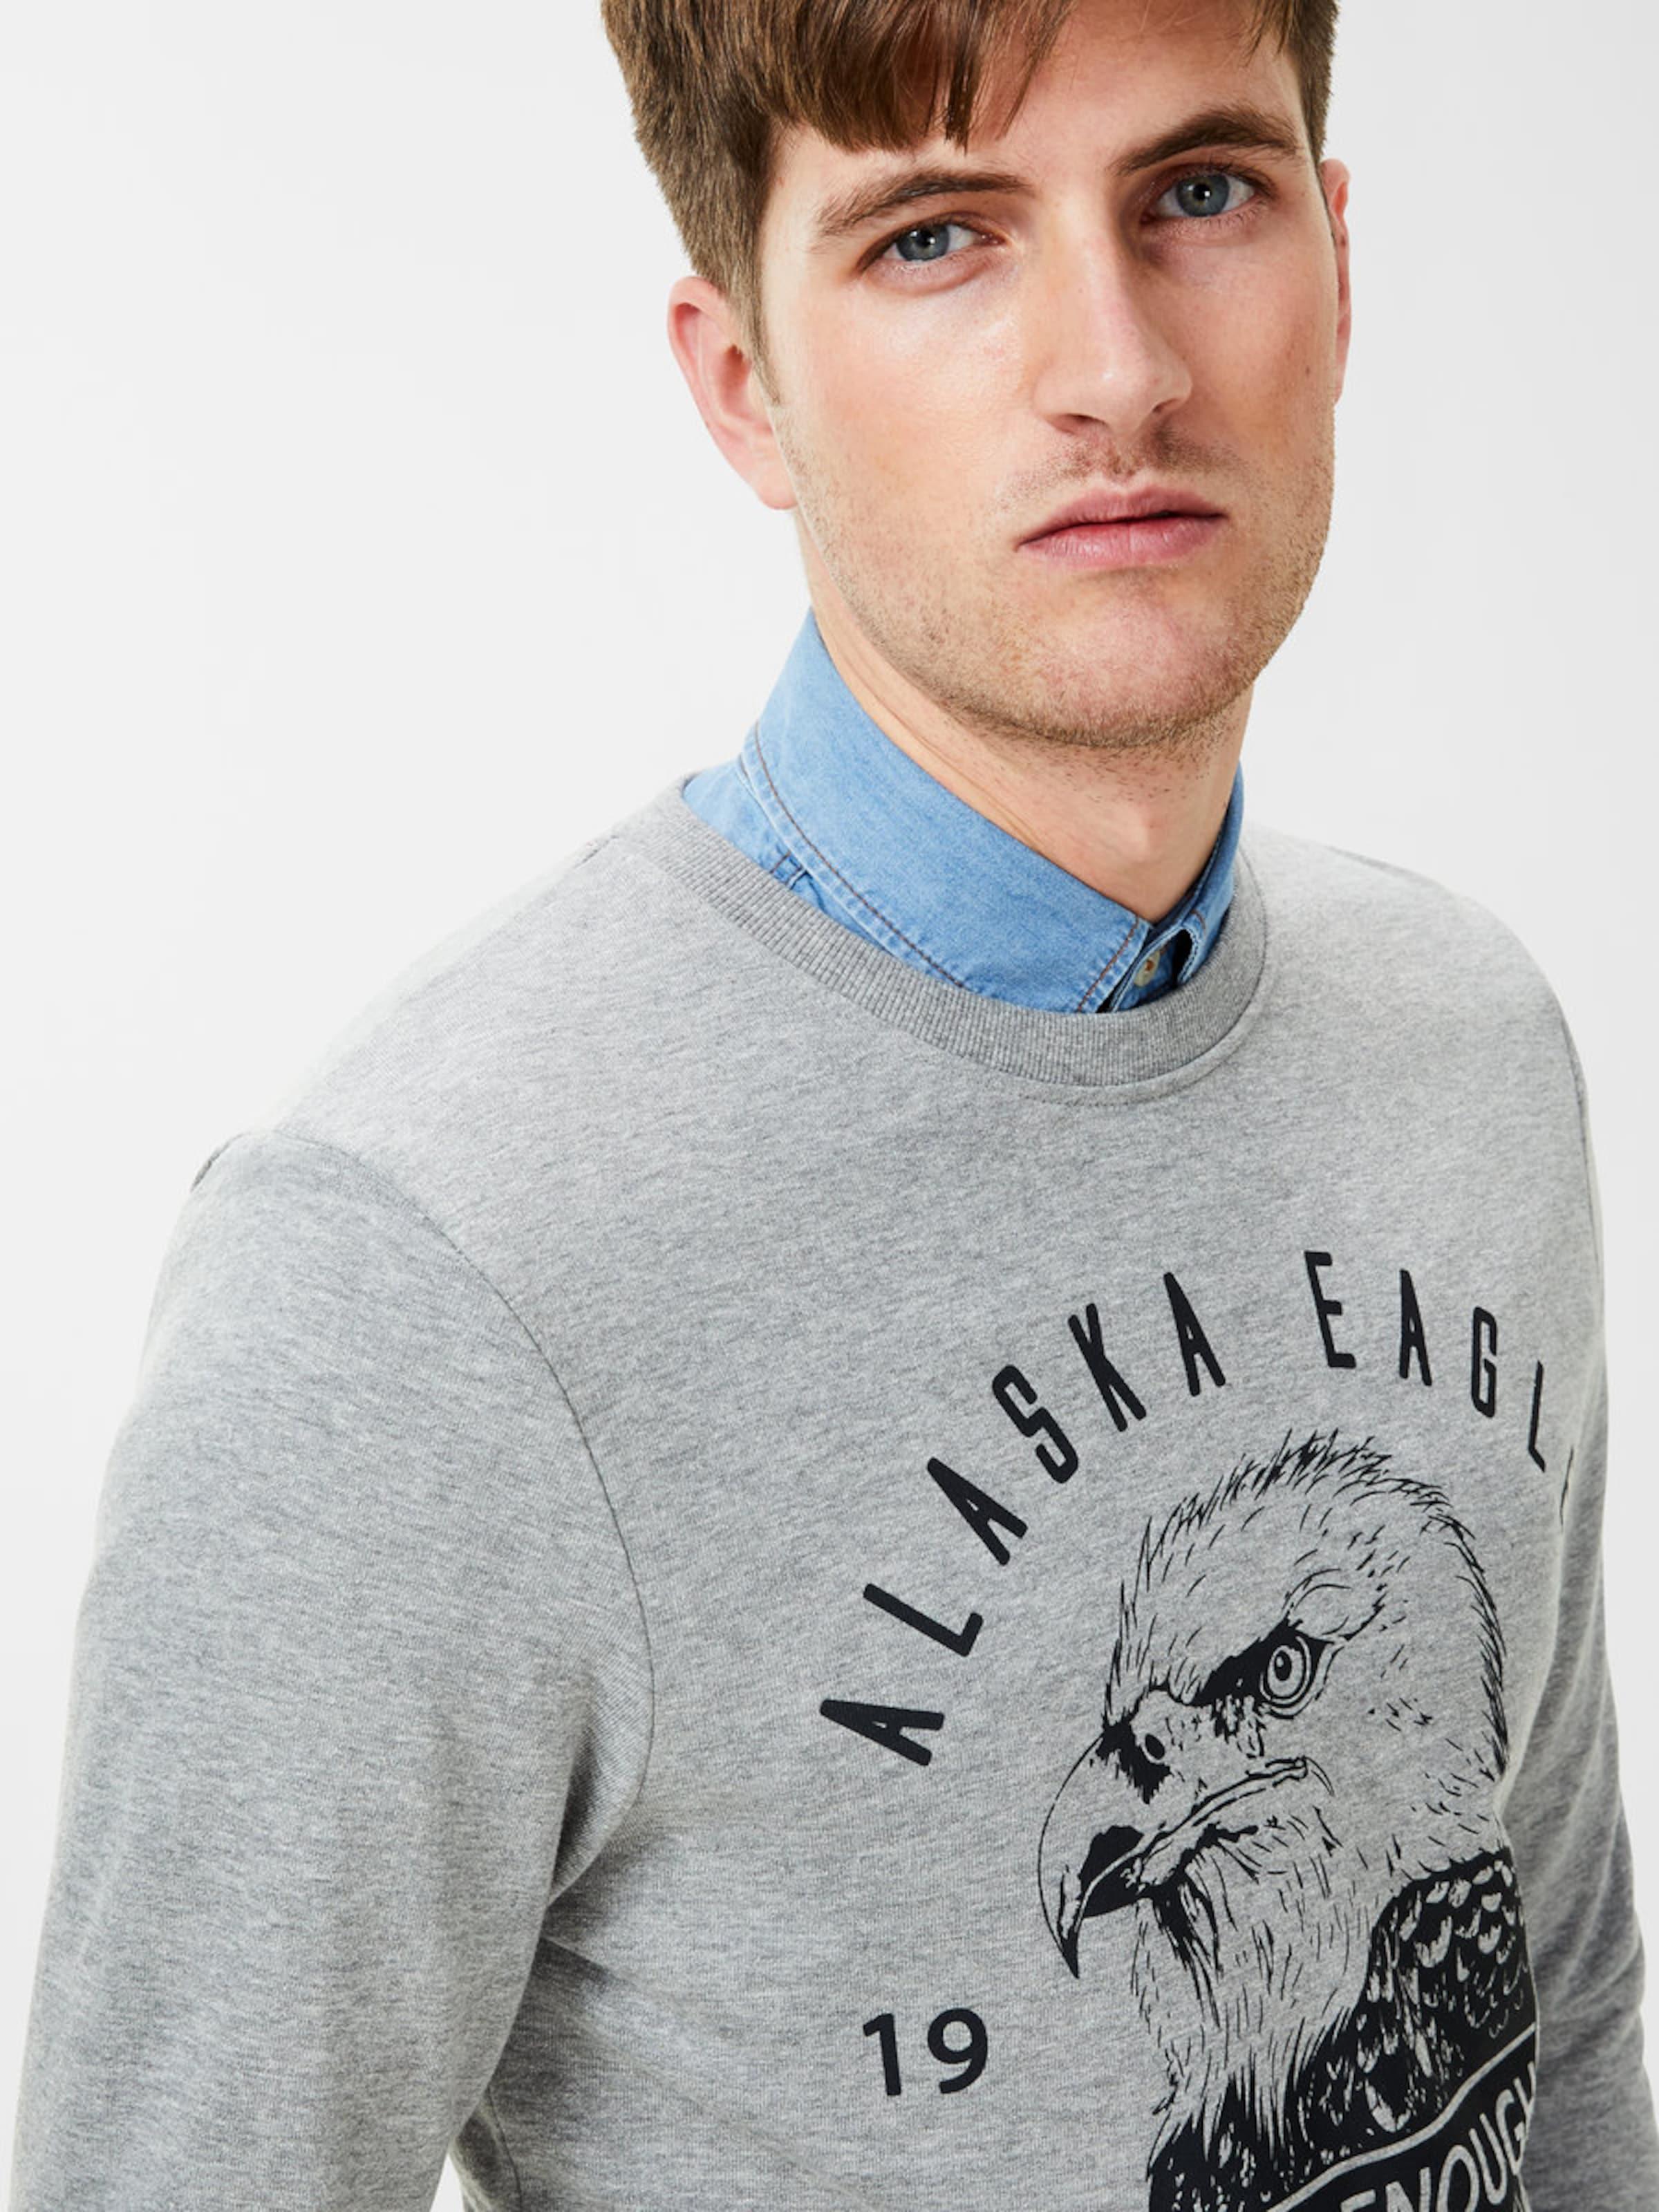 Produkt Print Sweatshirt Professionelle Günstig Online B4dBWP2JRj